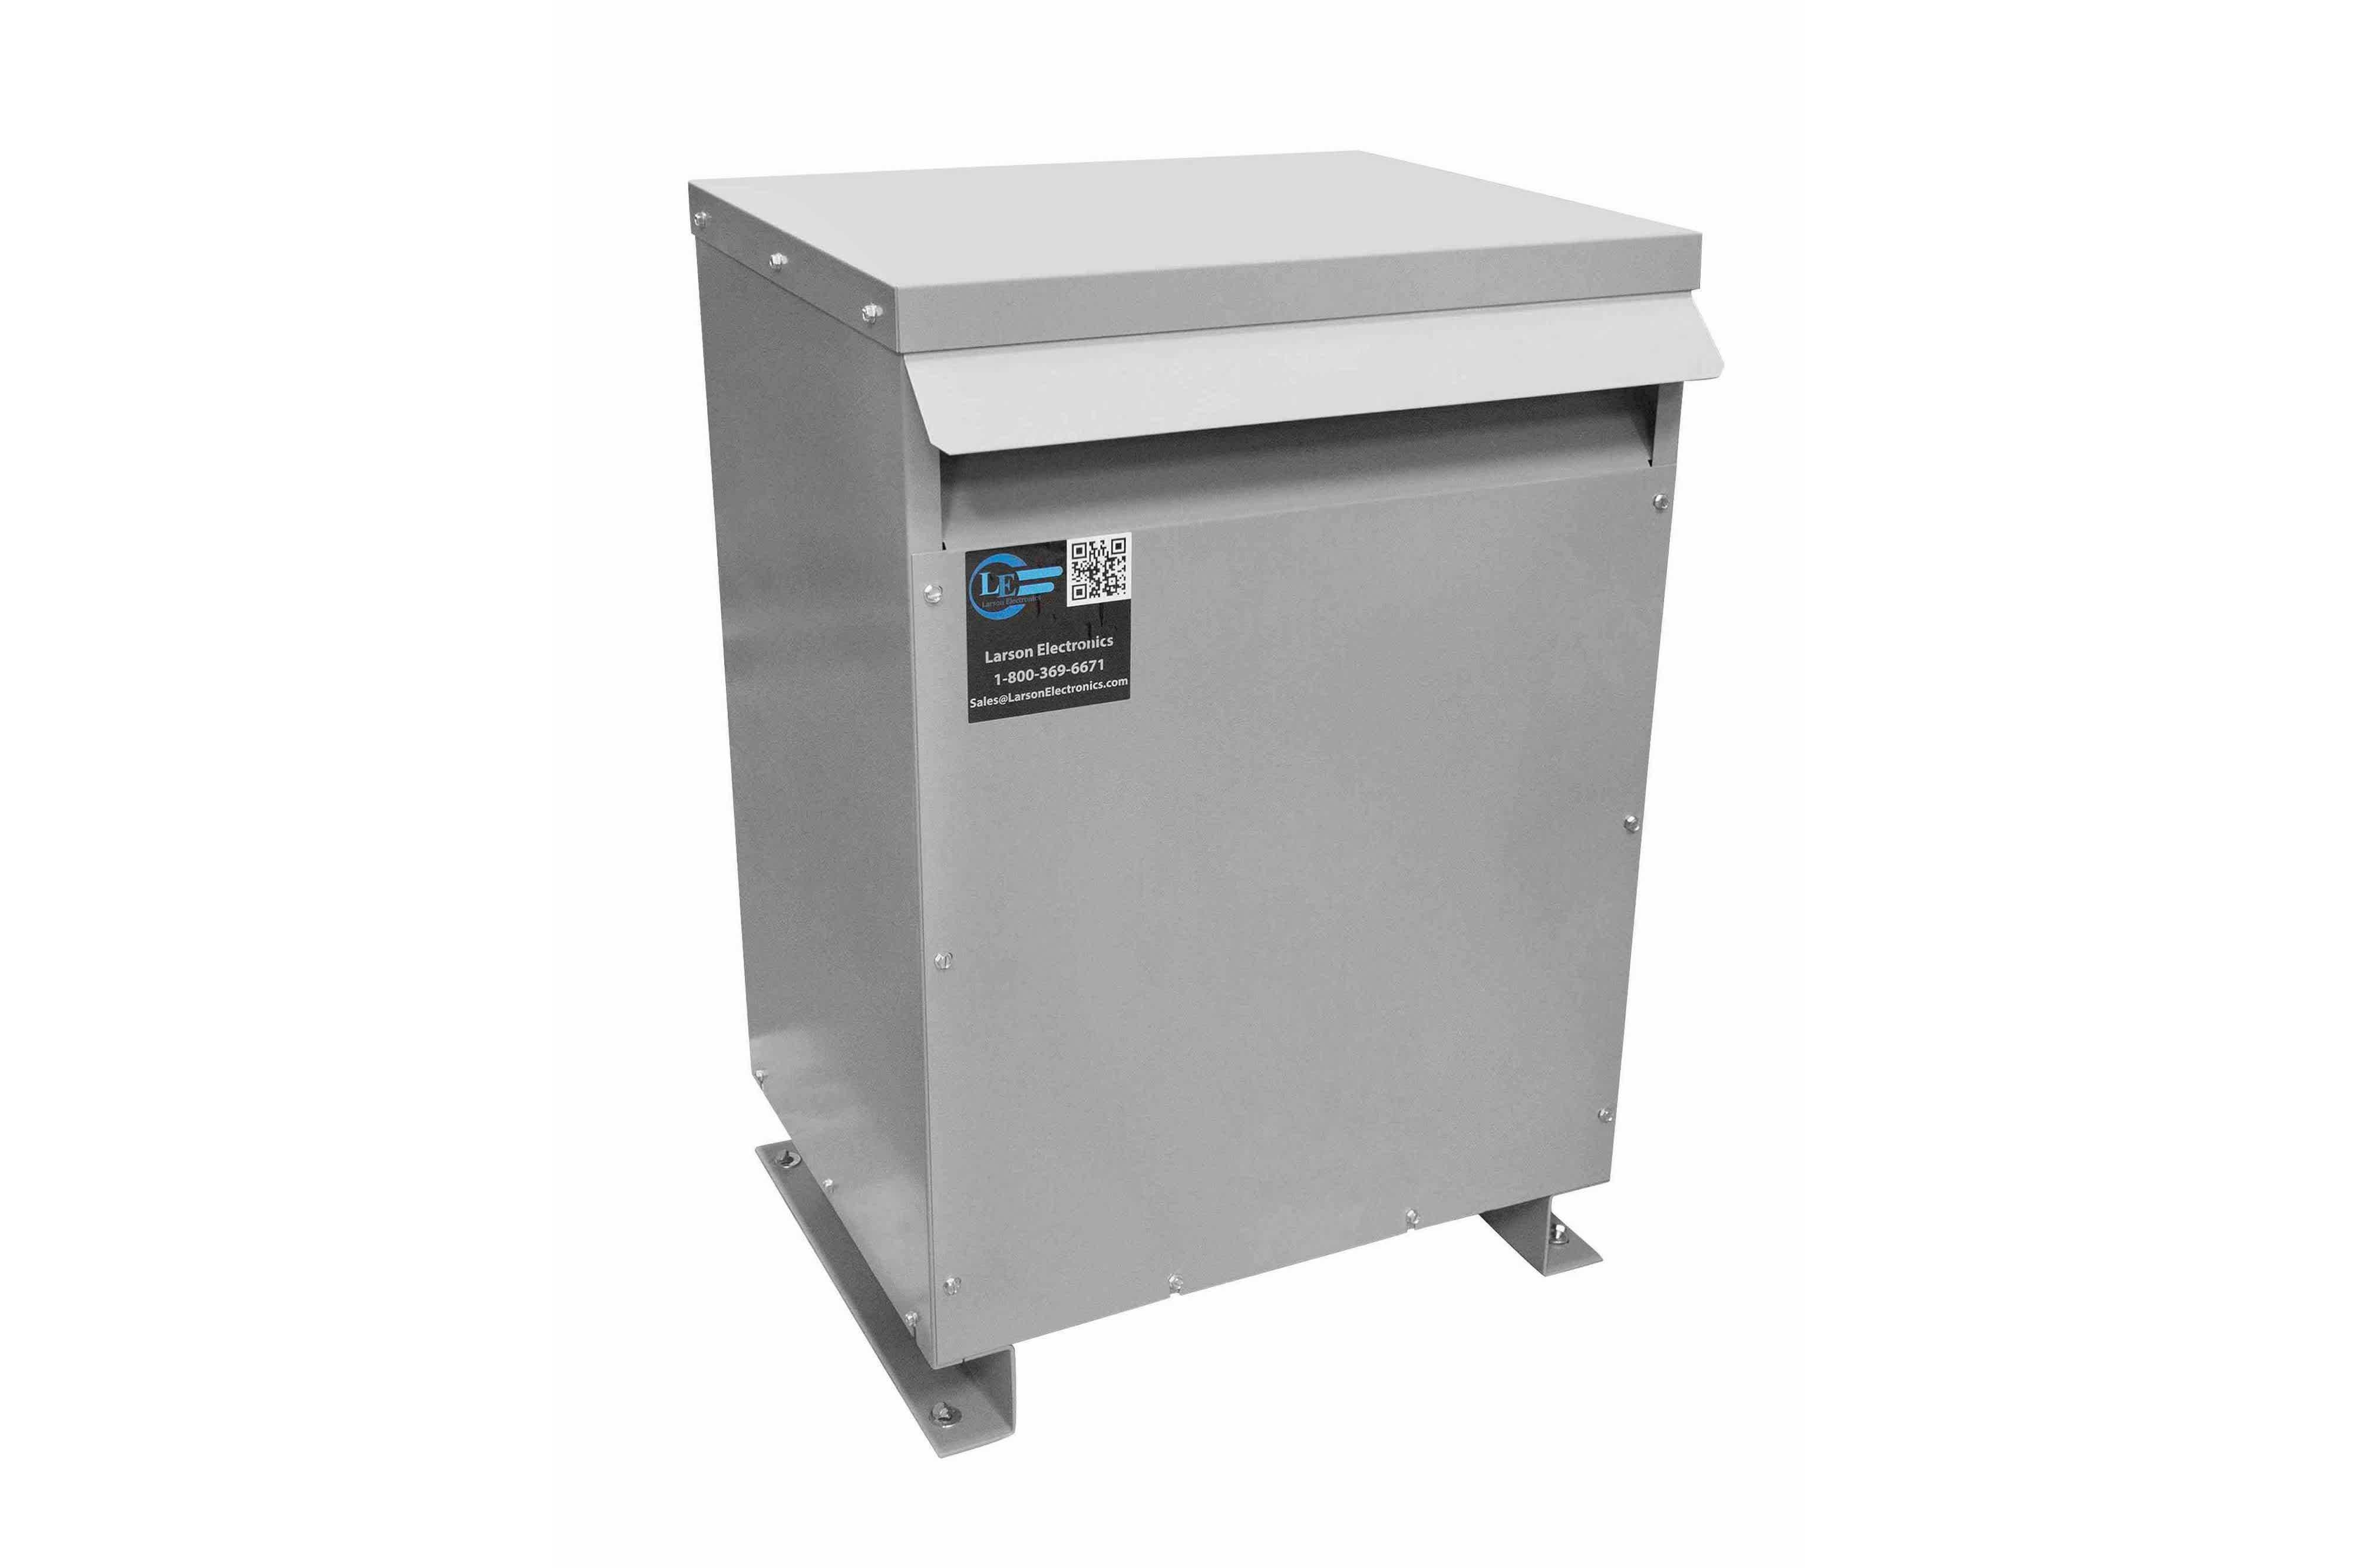 237.5 kVA 3PH Isolation Transformer, 208V Wye Primary, 208Y/120 Wye-N Secondary, N3R, Ventilated, 60 Hz